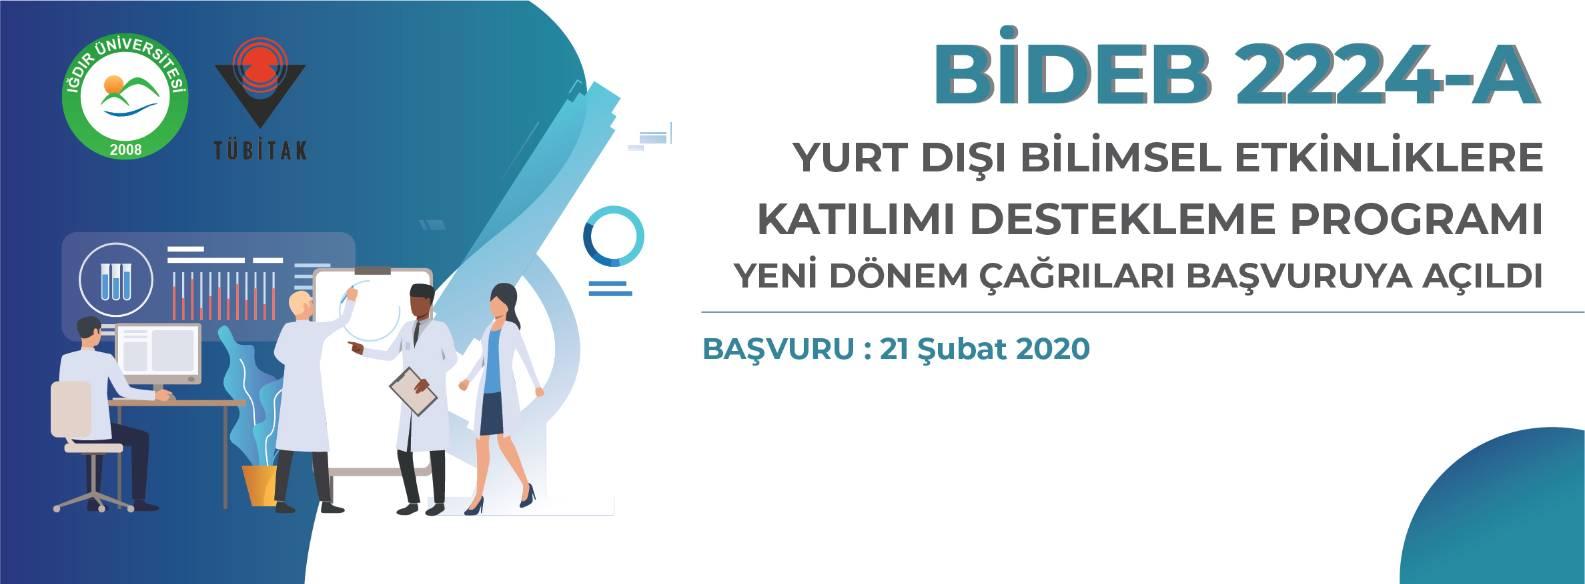 11-02-2020-yurt-disi-bilimsel-etkinlikler-banner-m.jpg